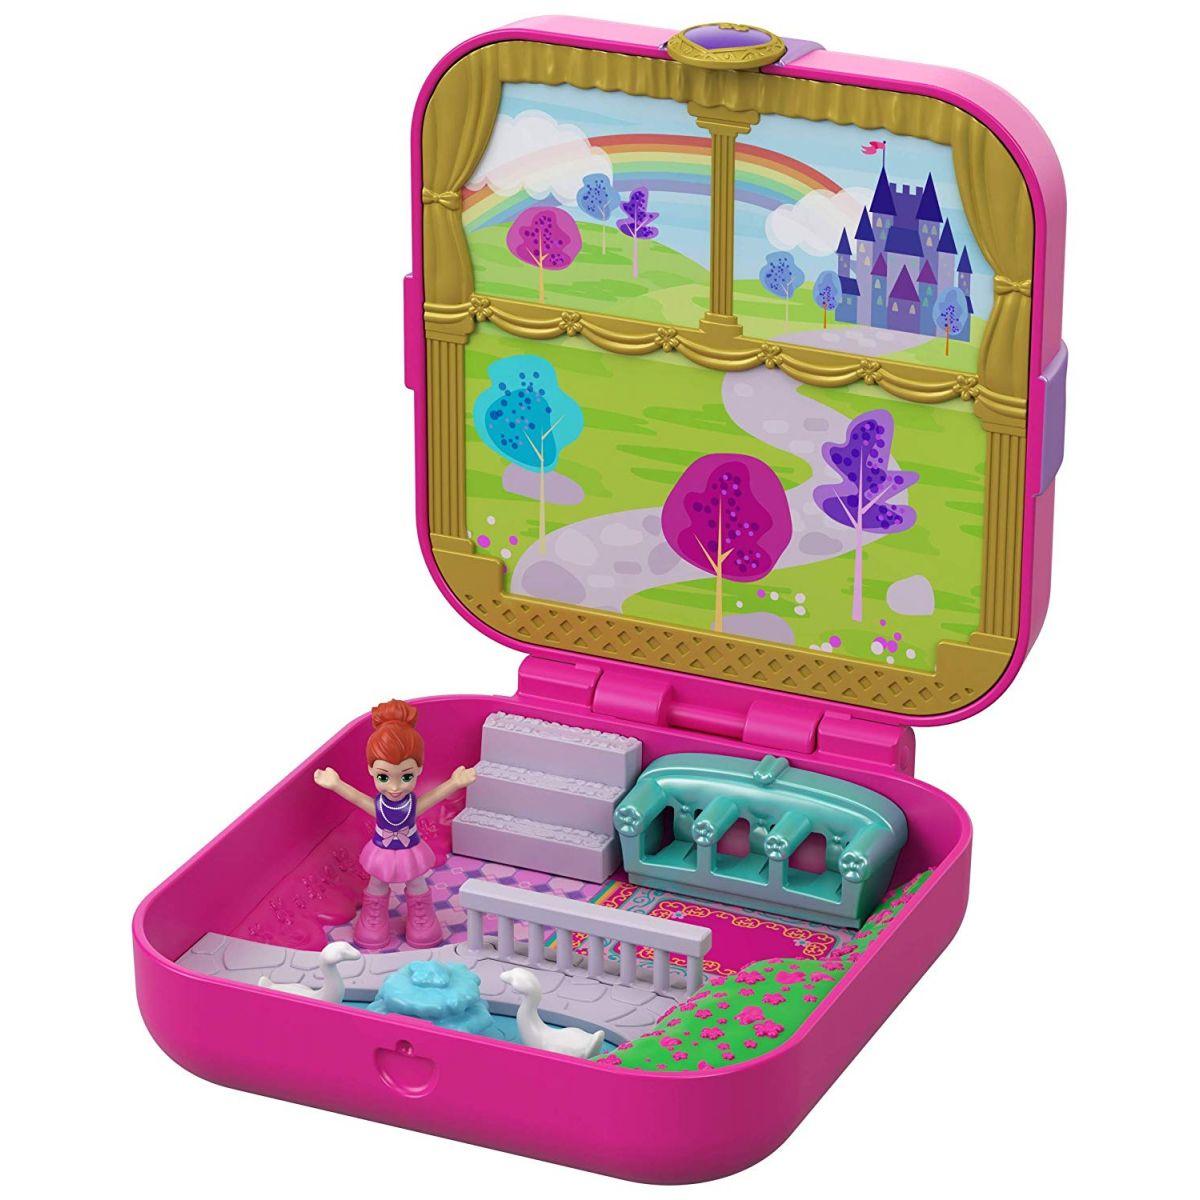 Mattel Polly Pocket pidi svet v krabičke Lil Princess Pad